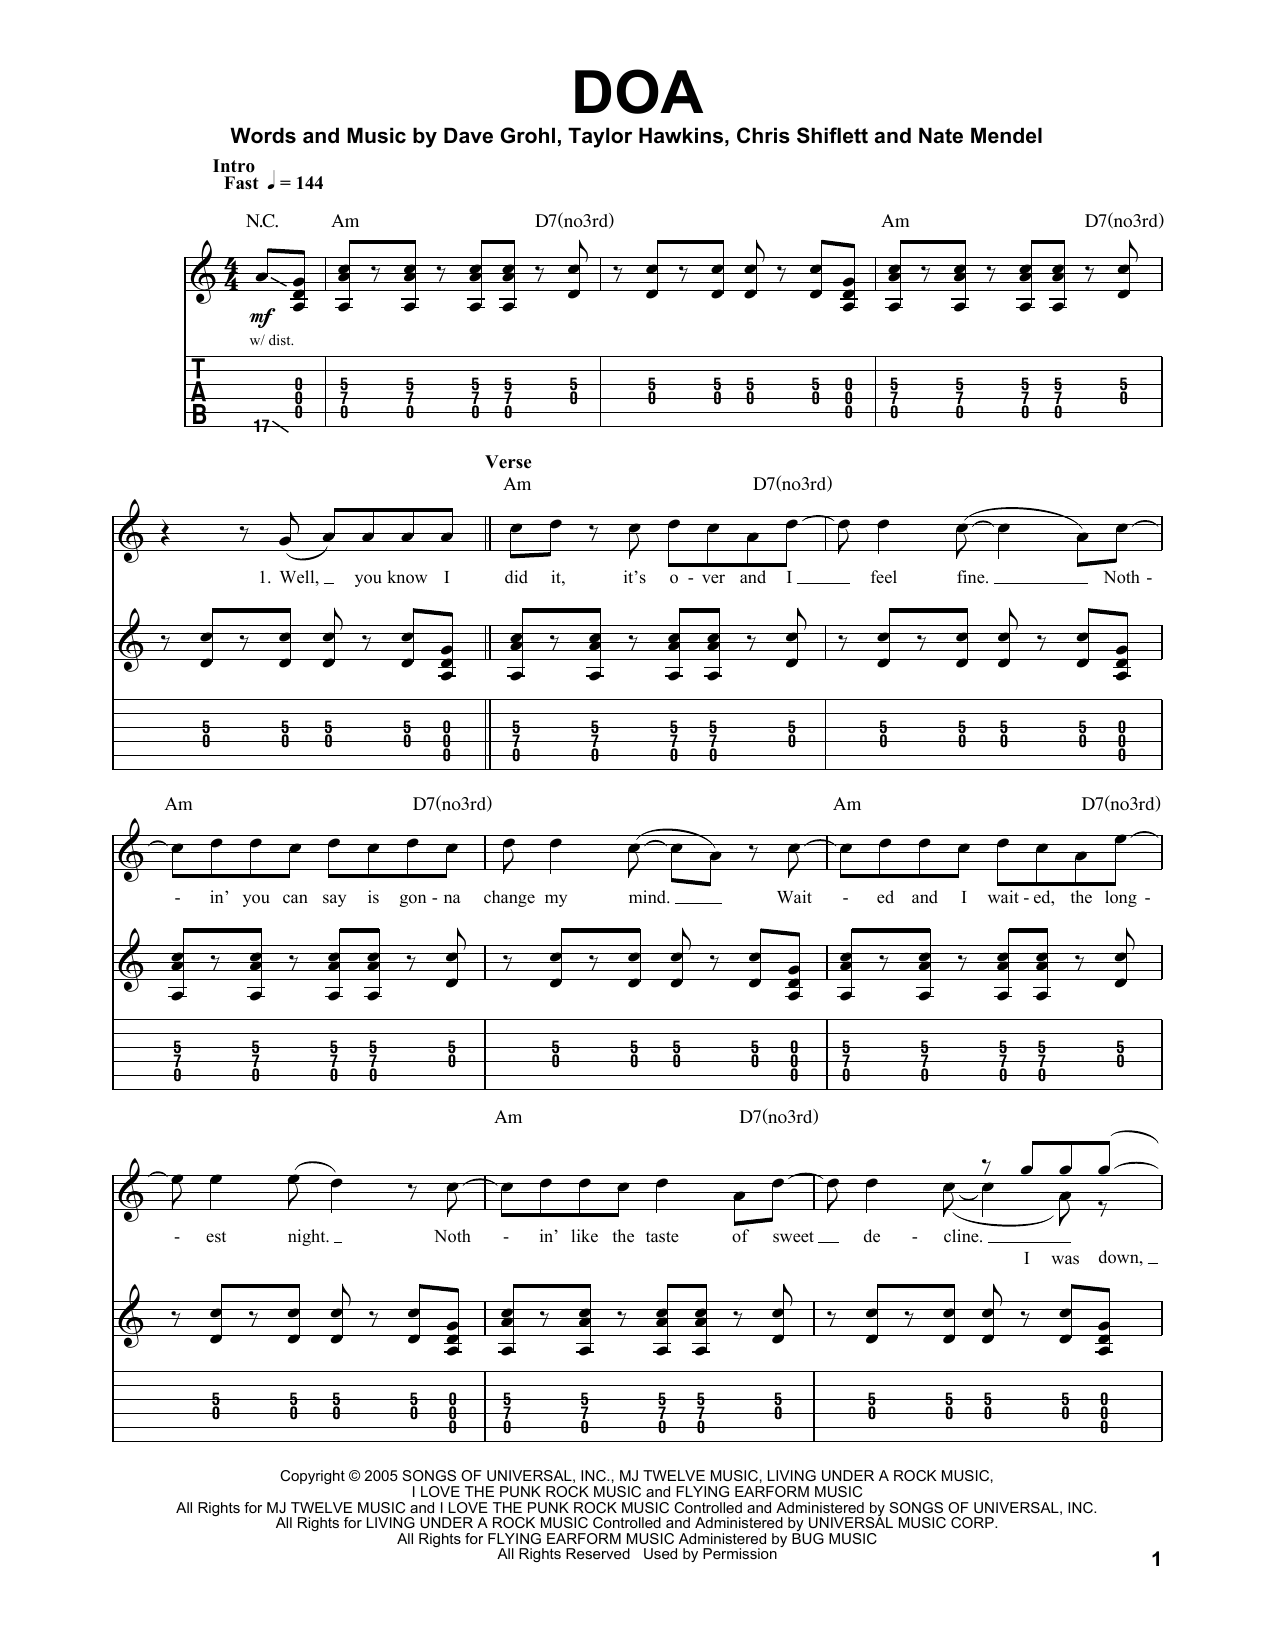 Attractive Everlong Guitar Chords Mold Beginner Guitar Piano